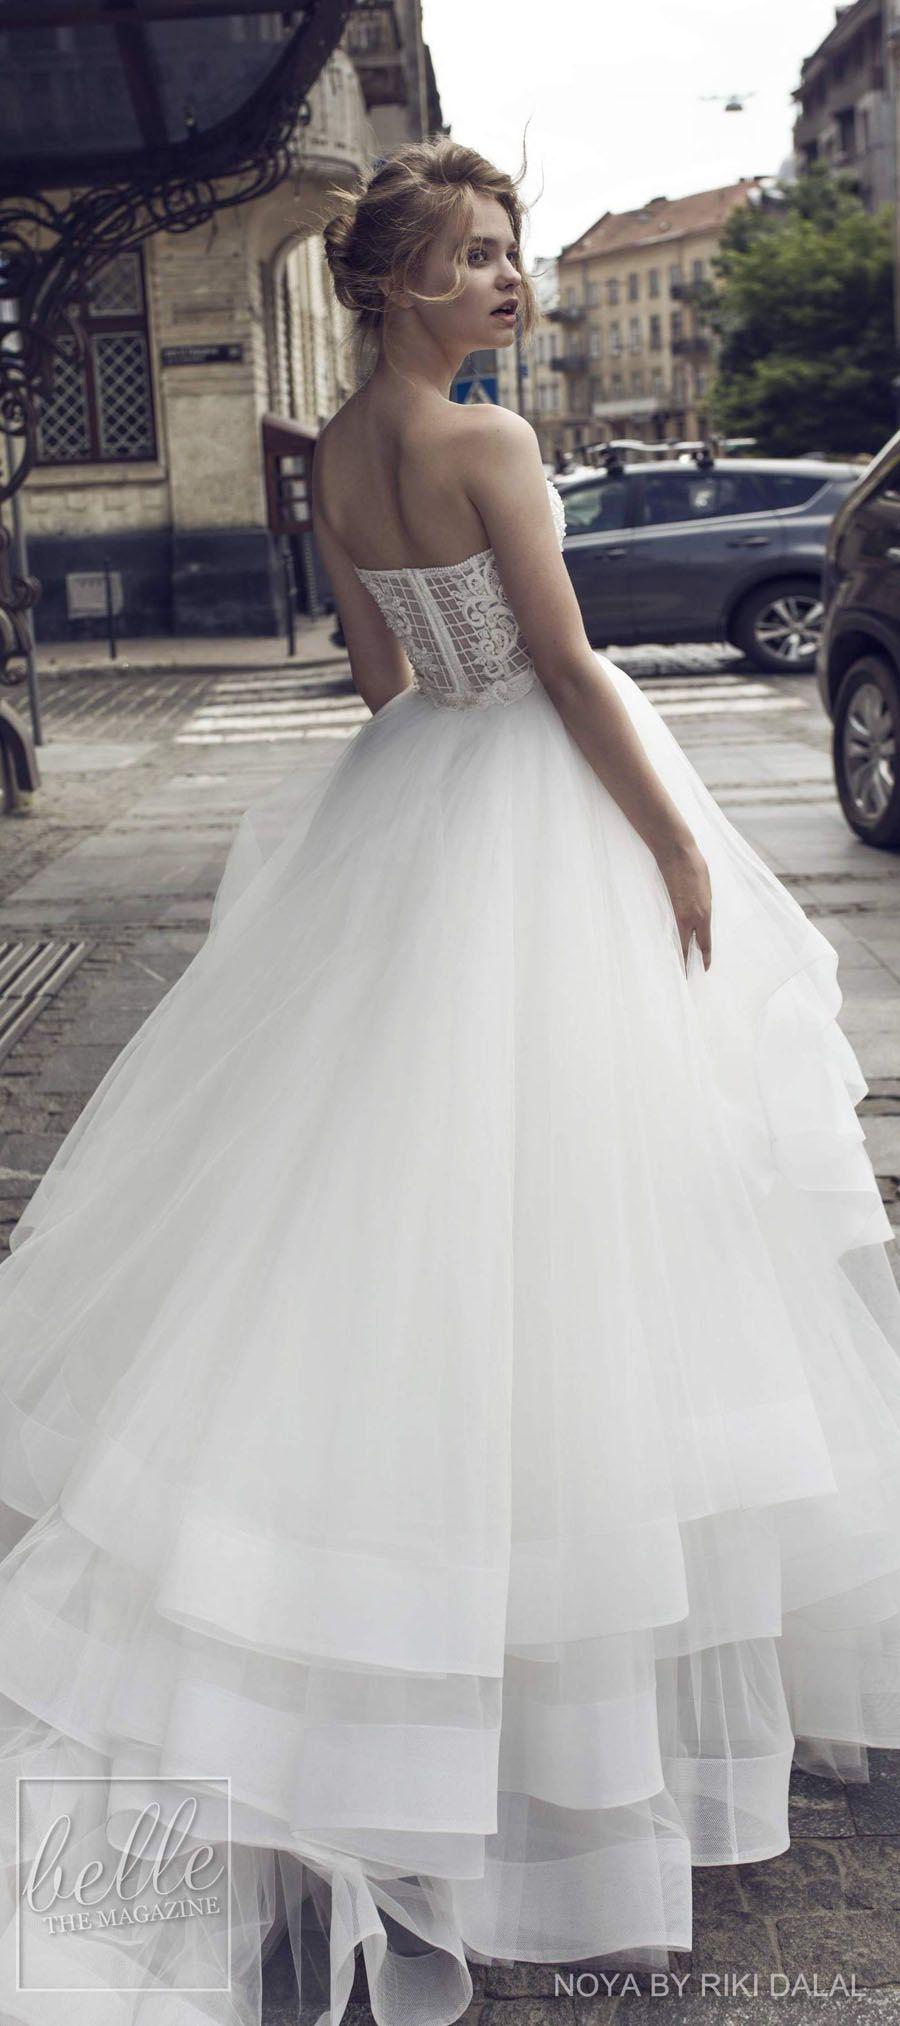 Woodland wedding dress  Noya by Riki Dalal Bridal  Shakespeare Collection  Shakespeare